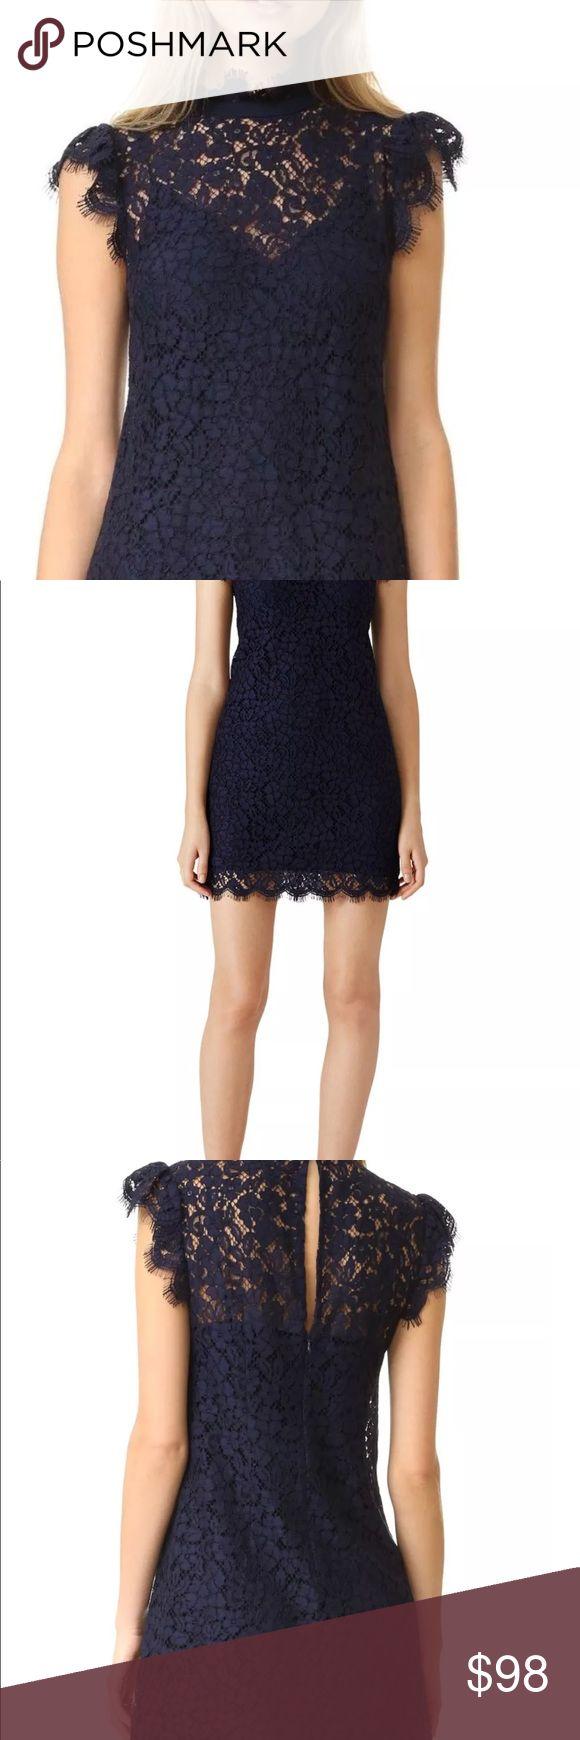 Rachel Zoe Dress NWT $345 RACHEL ZOE High Neck Navy Lace Dress Flutter Cap Sleeve Mini Shift 6 Rachel Zoe Dresses Midi